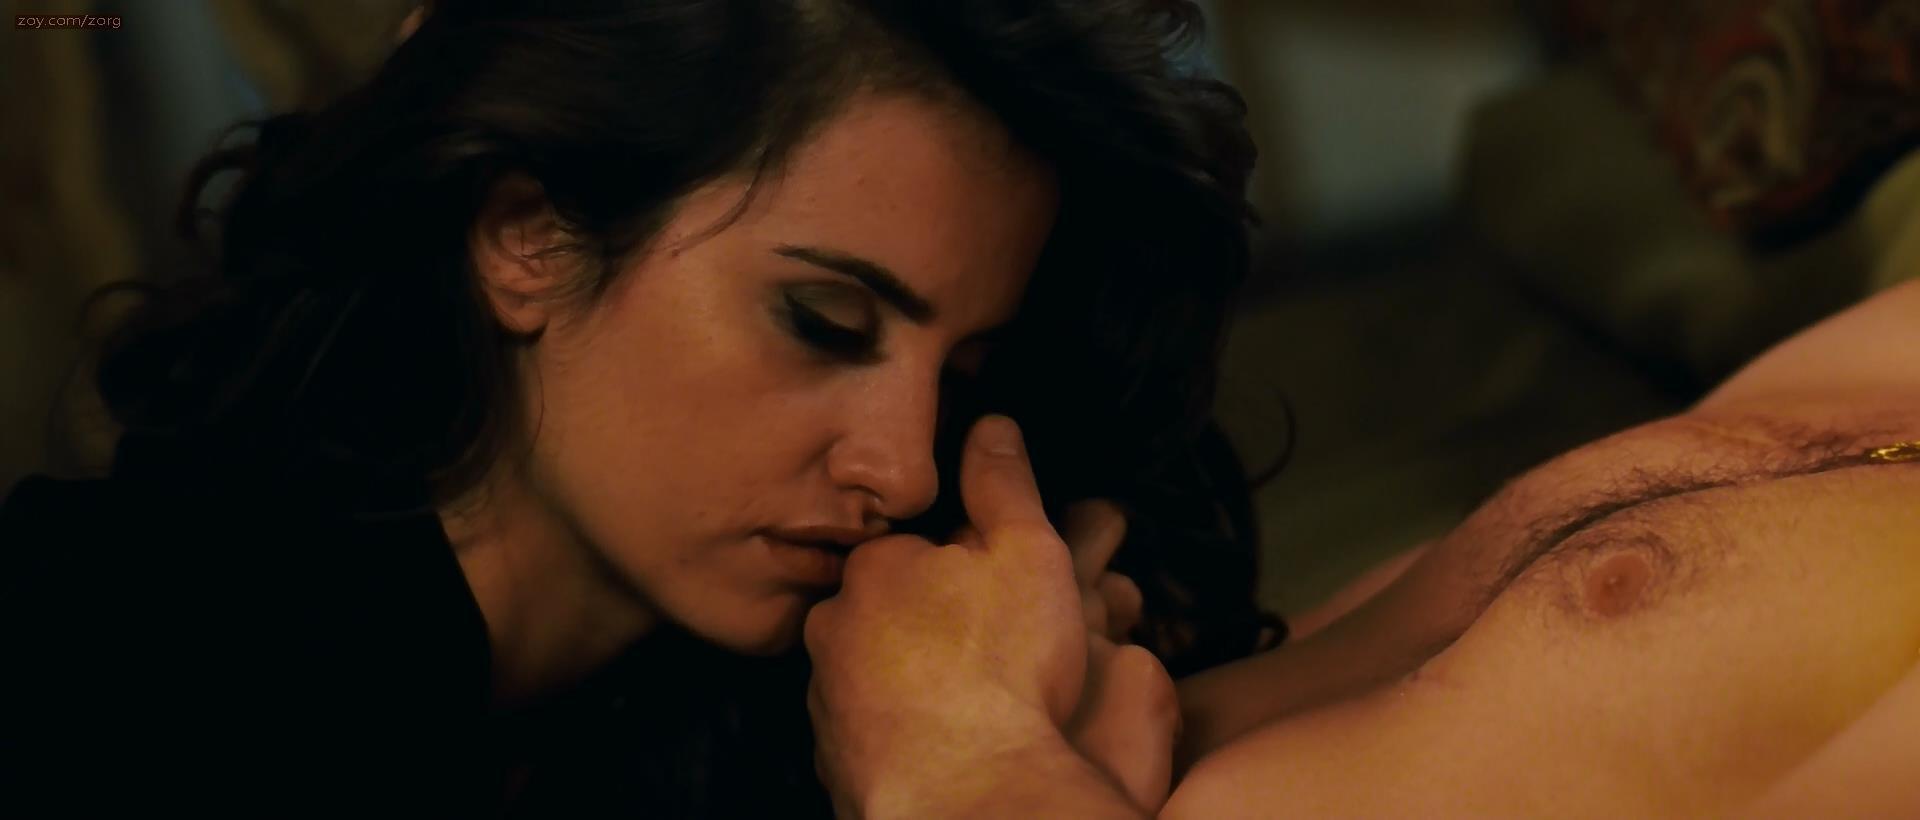 Penelope cruz sex picture